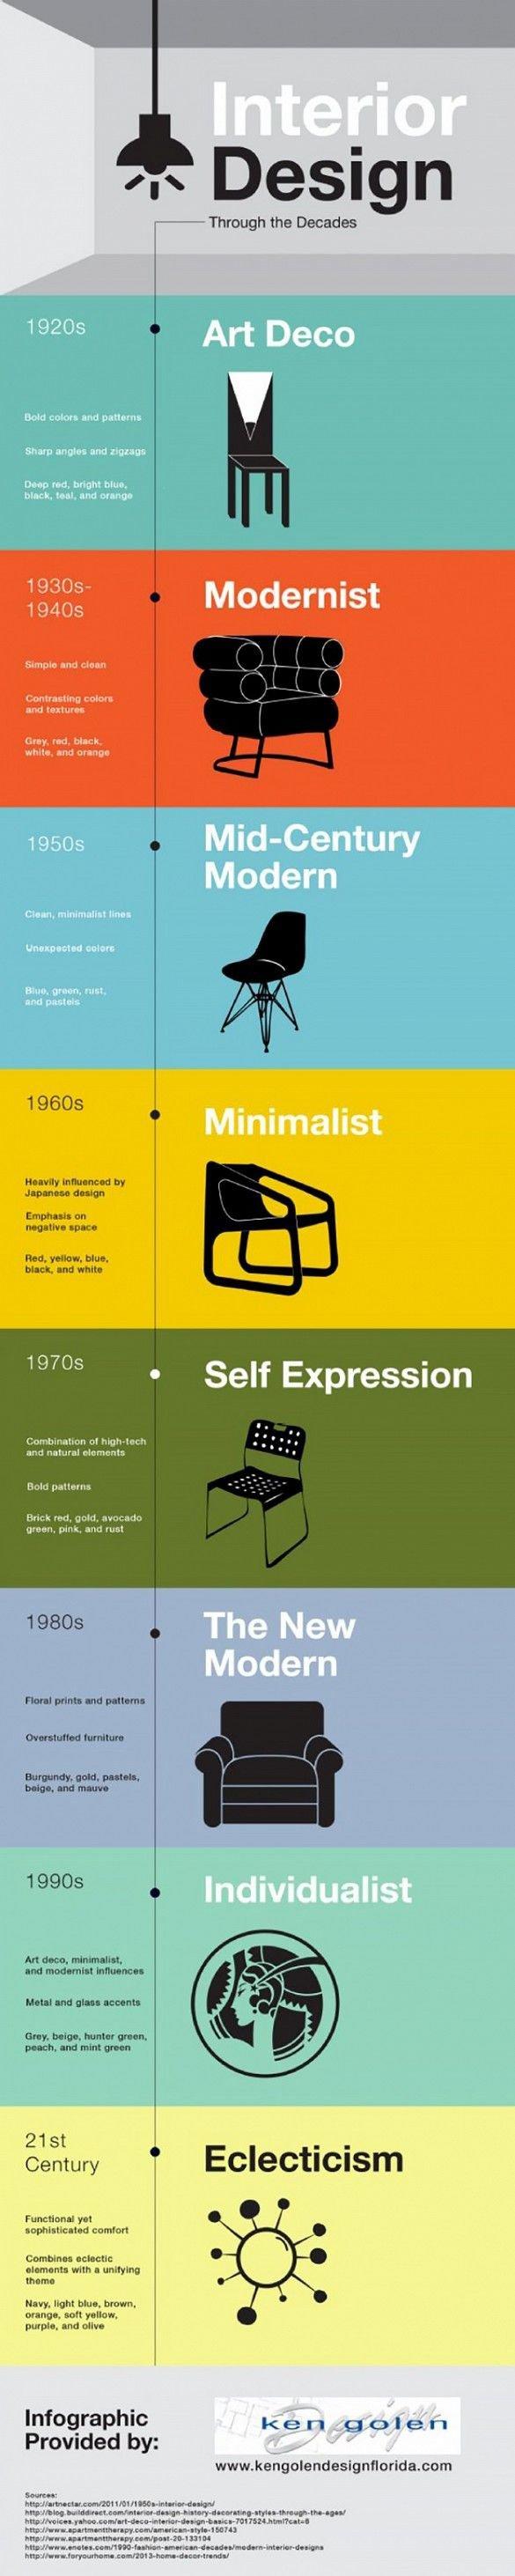 Interior Design through the Decades